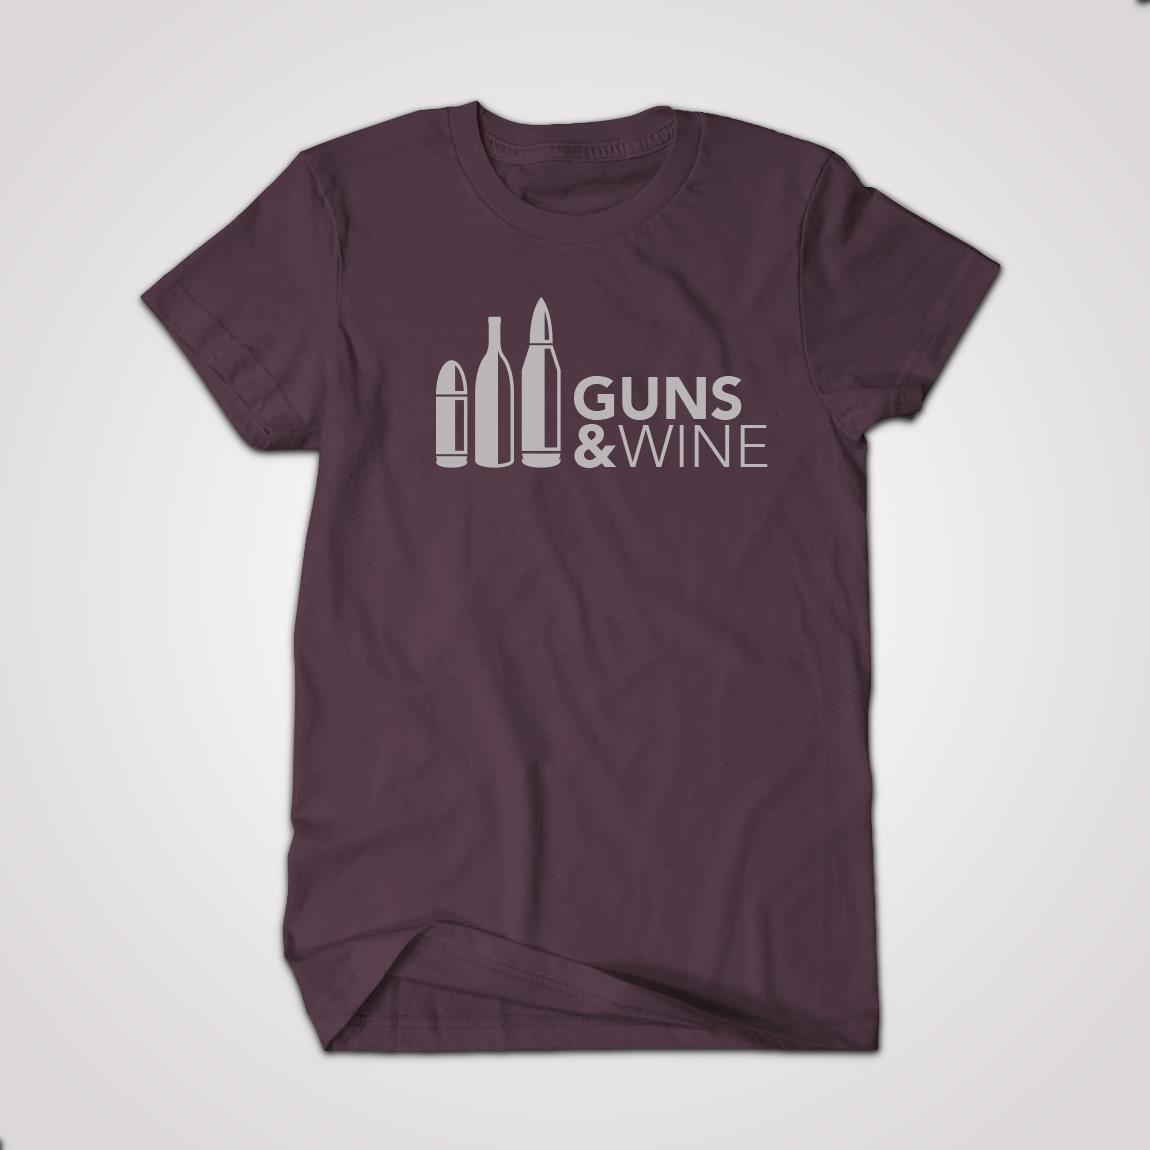 Guns&Wine-Logo-on-Shirts-Wine.jpg